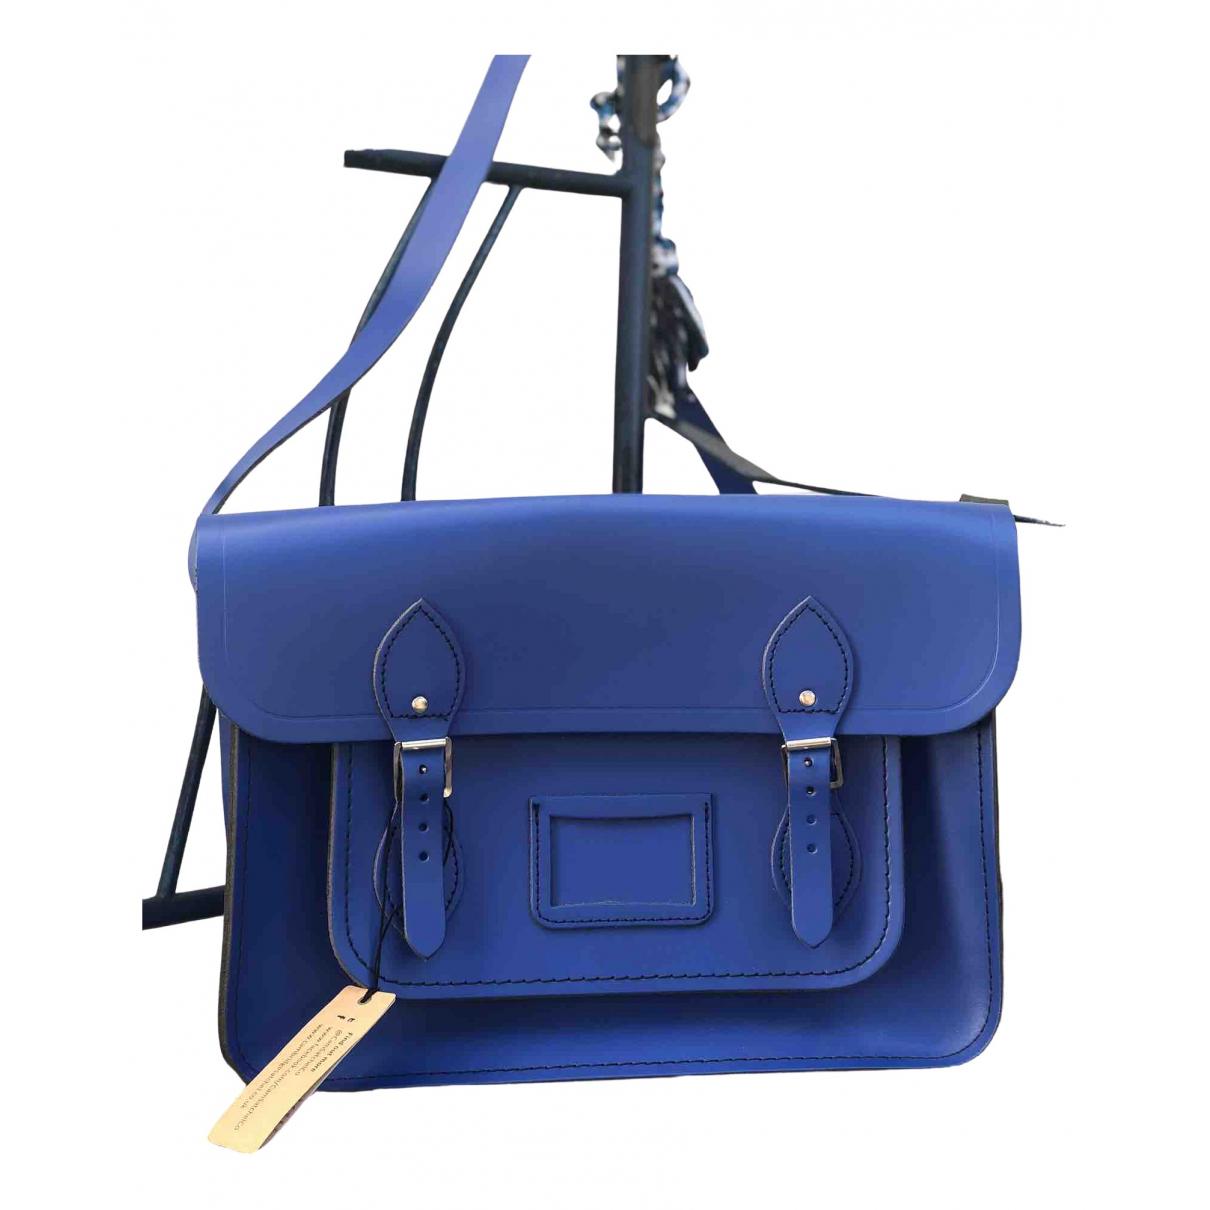 Cambridge Satchel Company N Blue Leather handbag for Women N